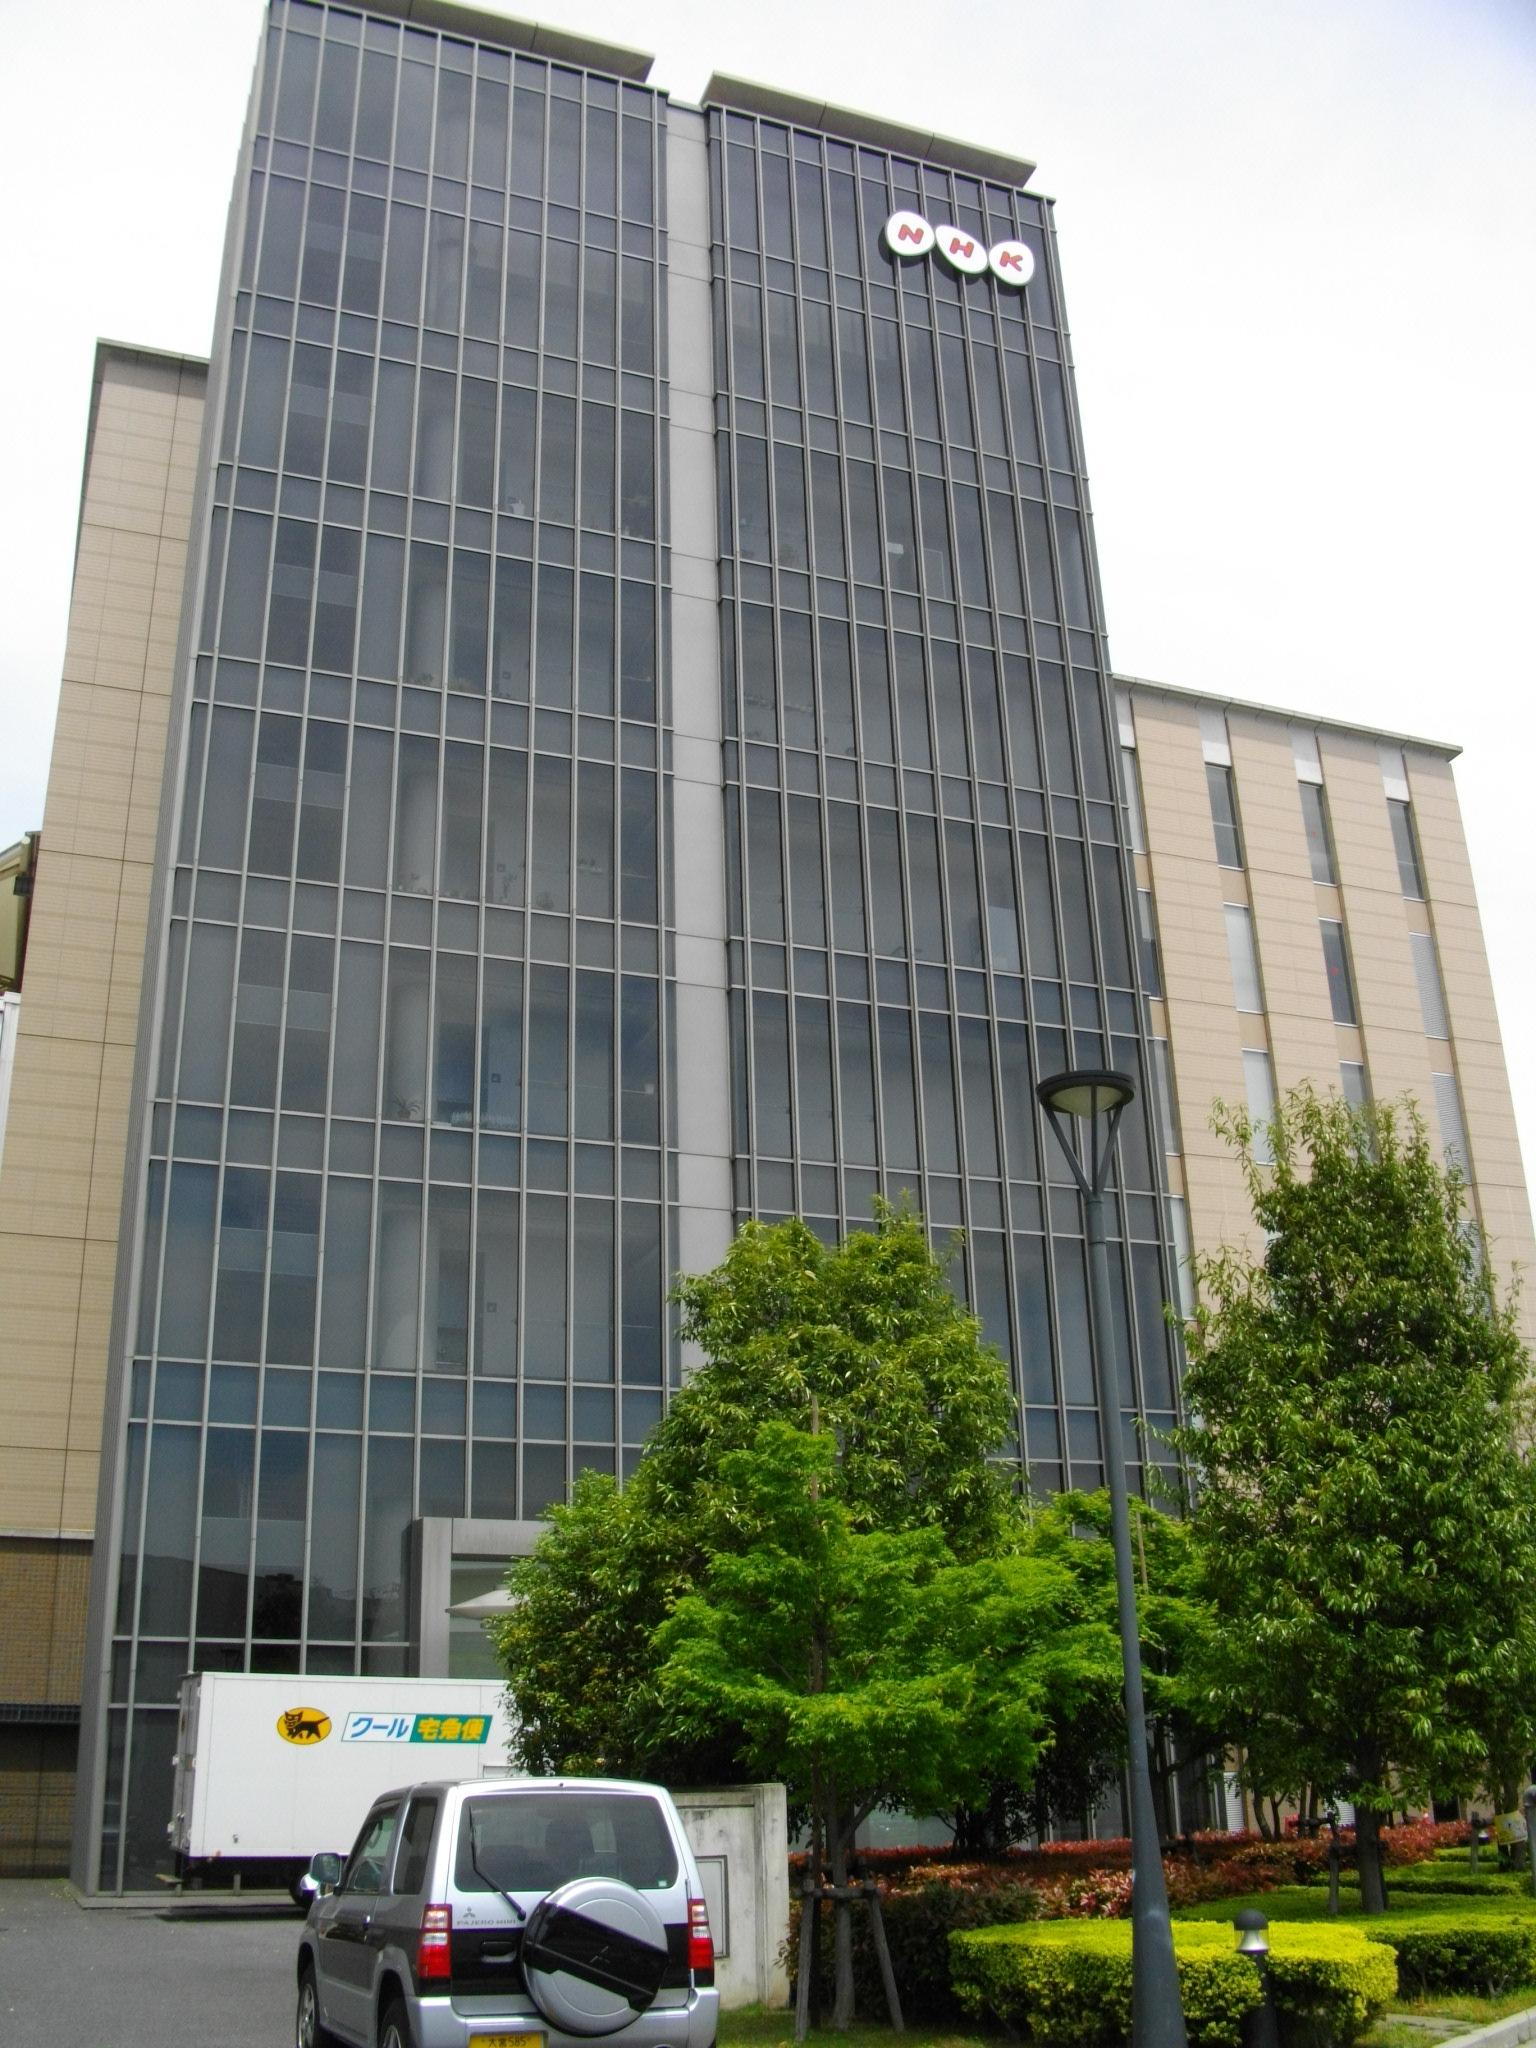 テレビ 番組 表 神奈川 県